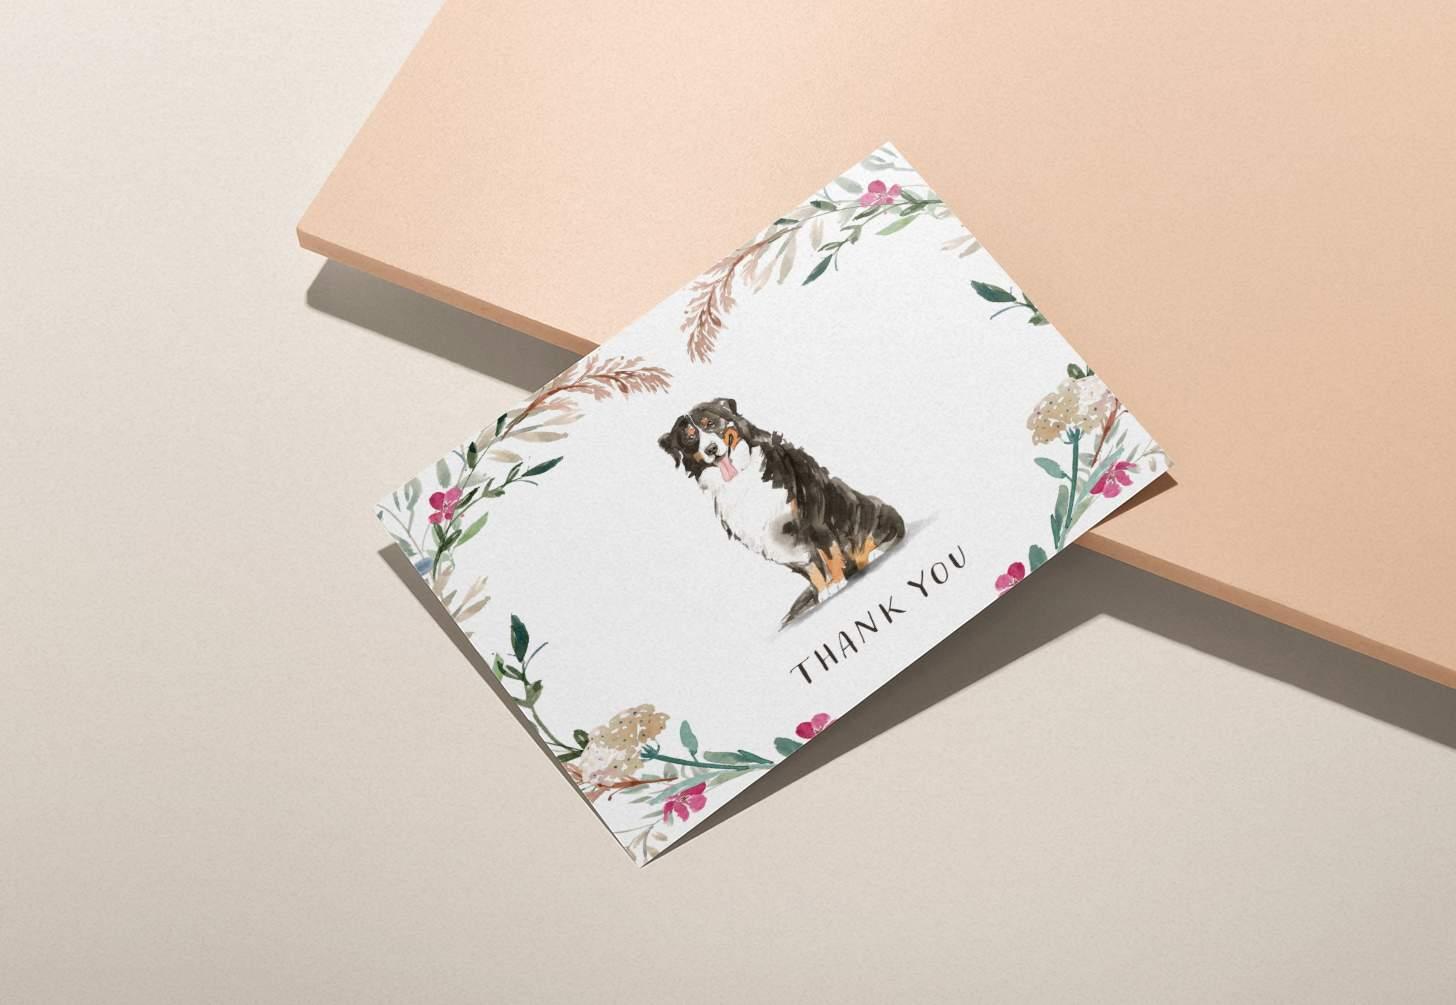 Bernese mountain dog design on pink background